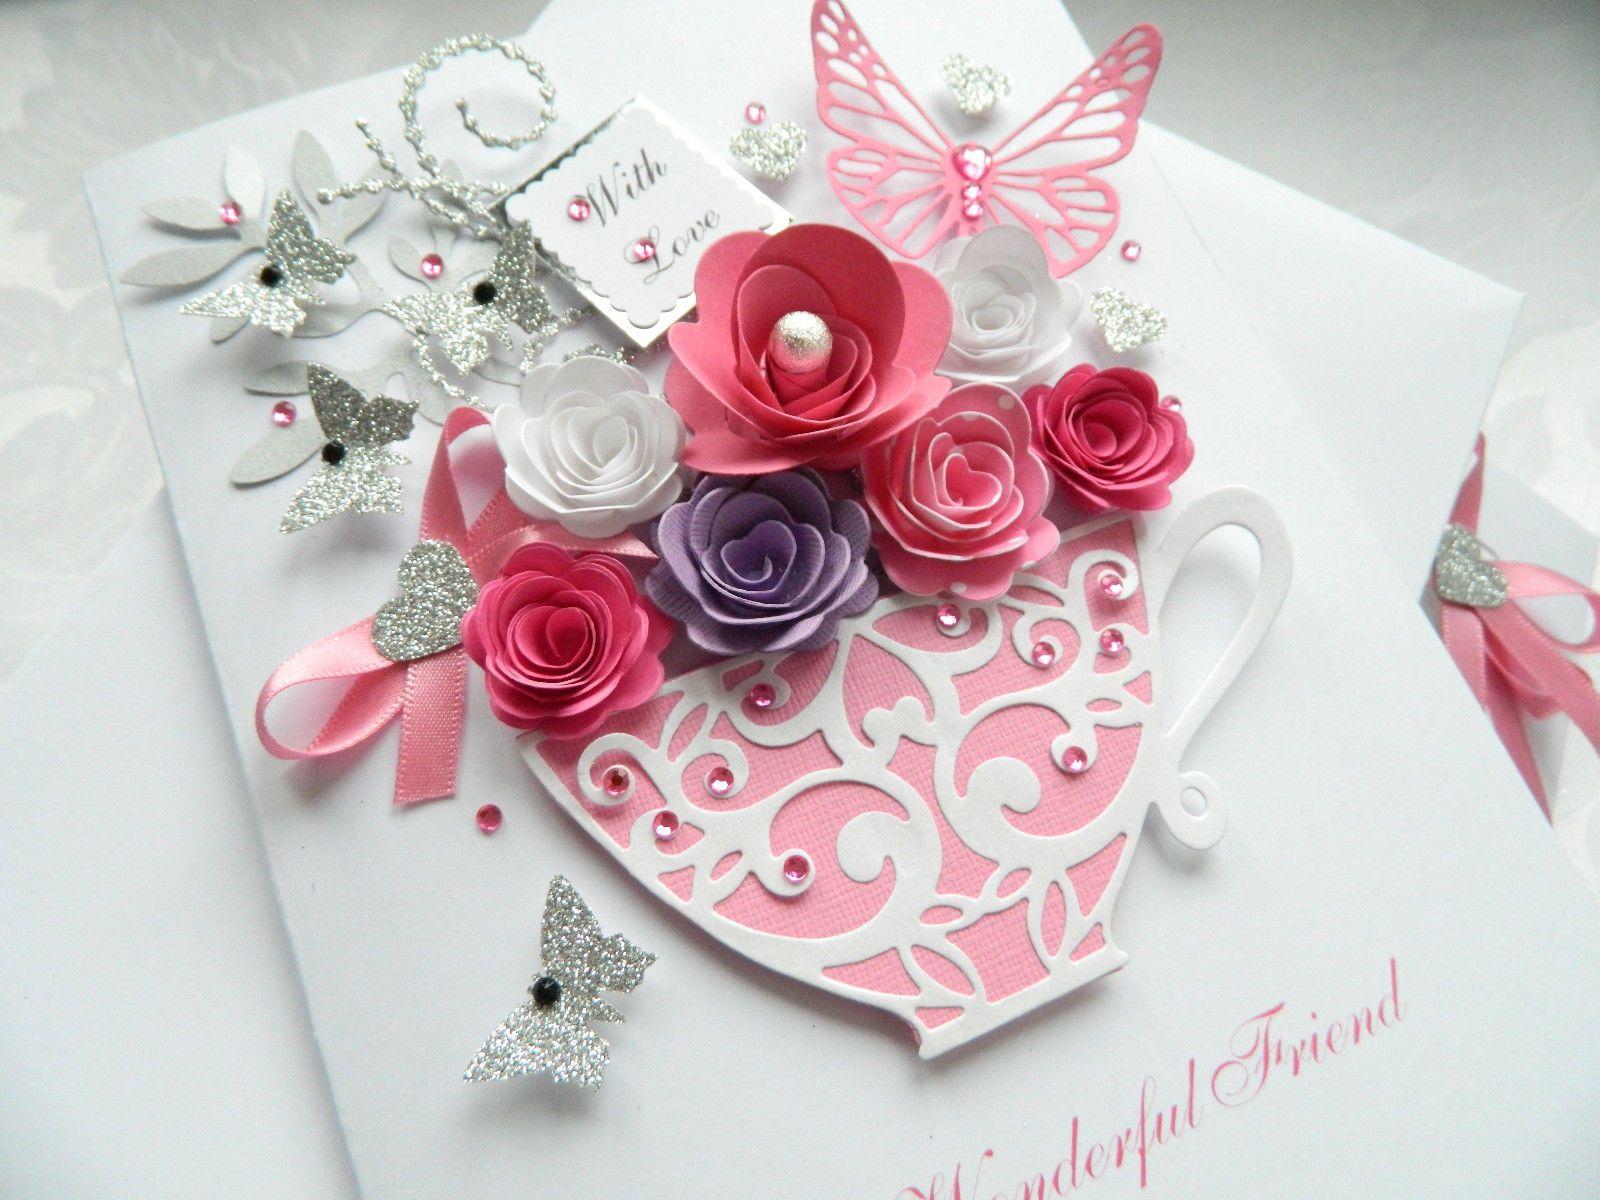 60th Handmade Personalised Birthday Card Boxed